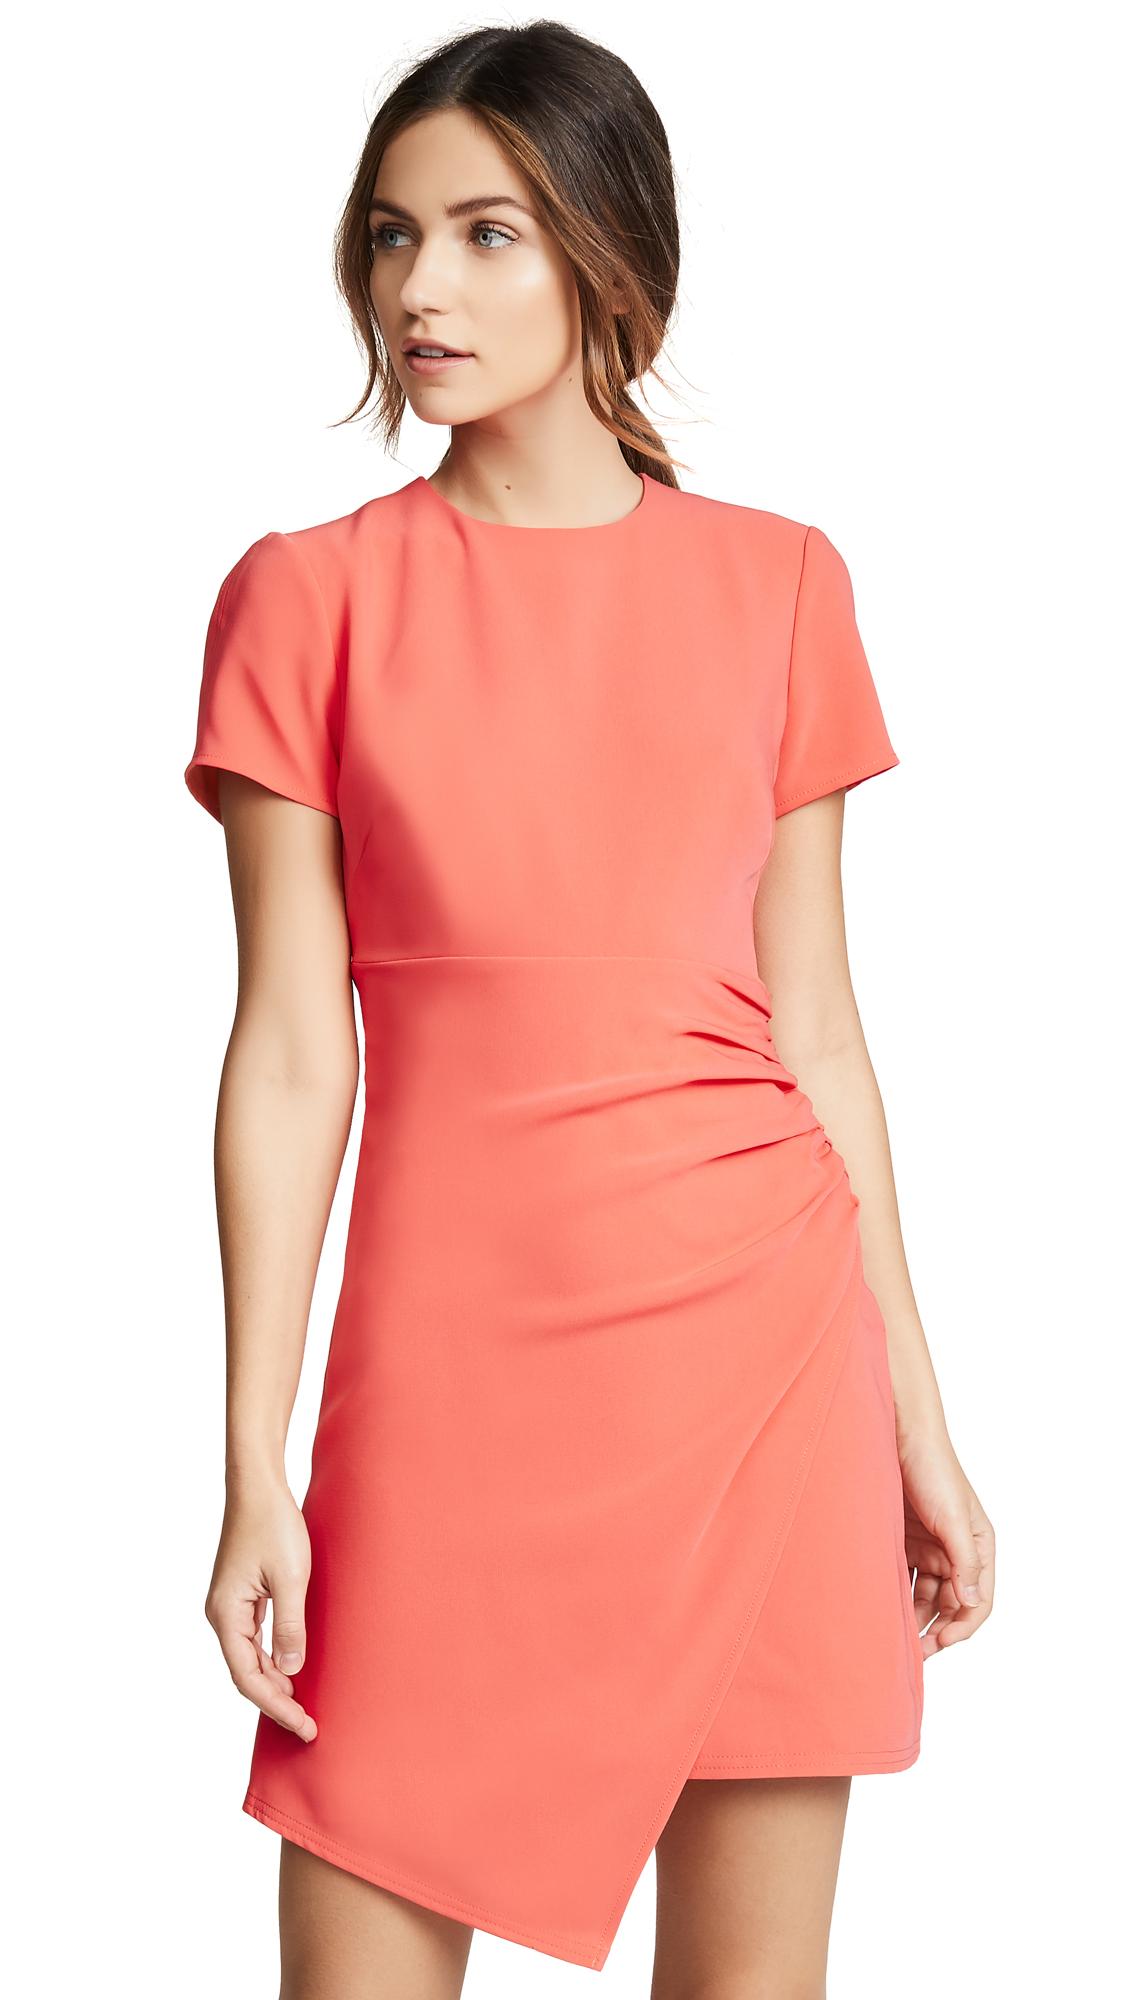 Cinq a Sept Imogen Dress - Hot Coral